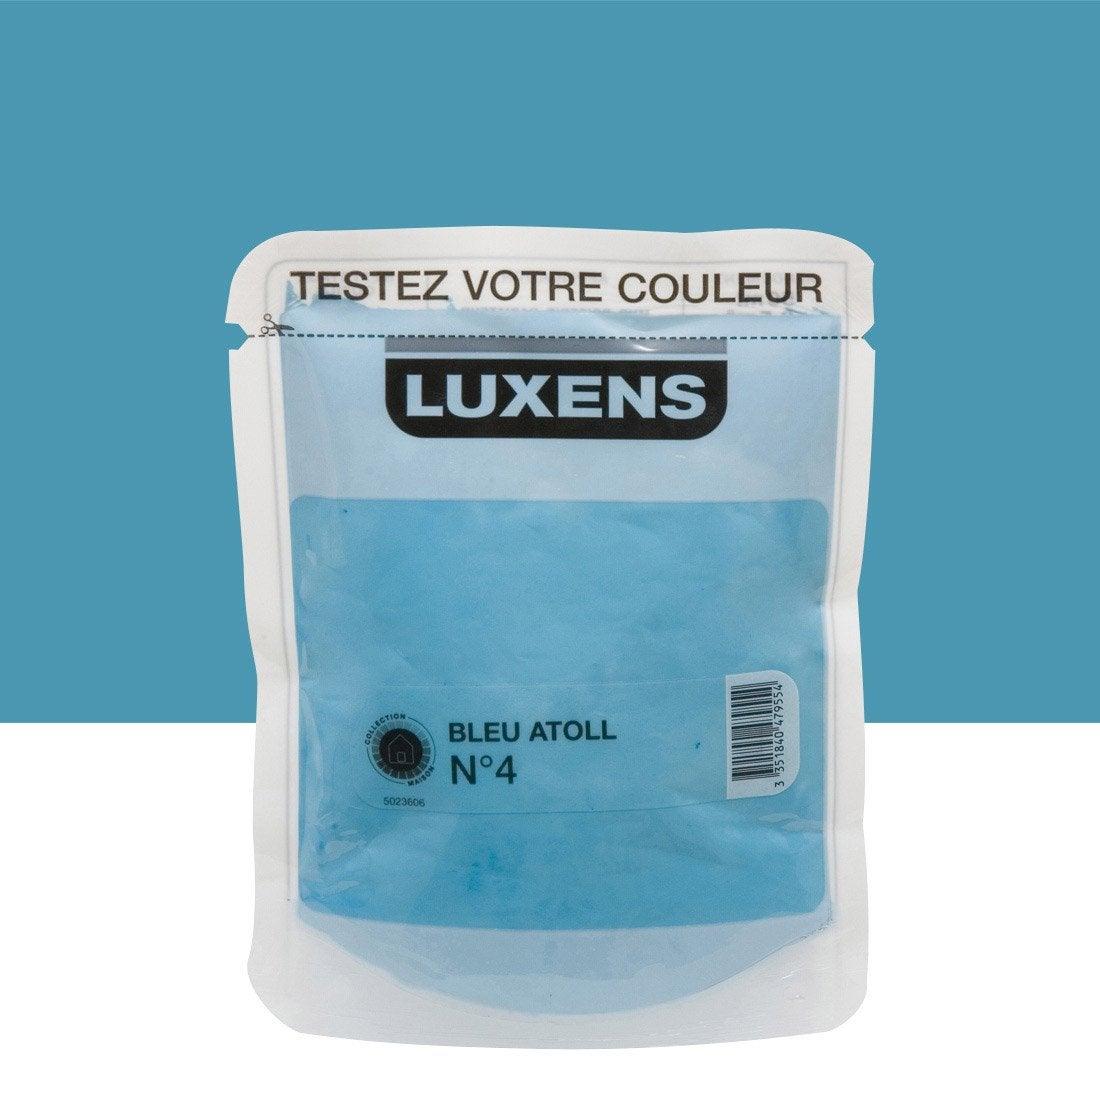 testeur peinture bleu atoll 4 luxens couleurs int rieures satin l leroy merlin. Black Bedroom Furniture Sets. Home Design Ideas